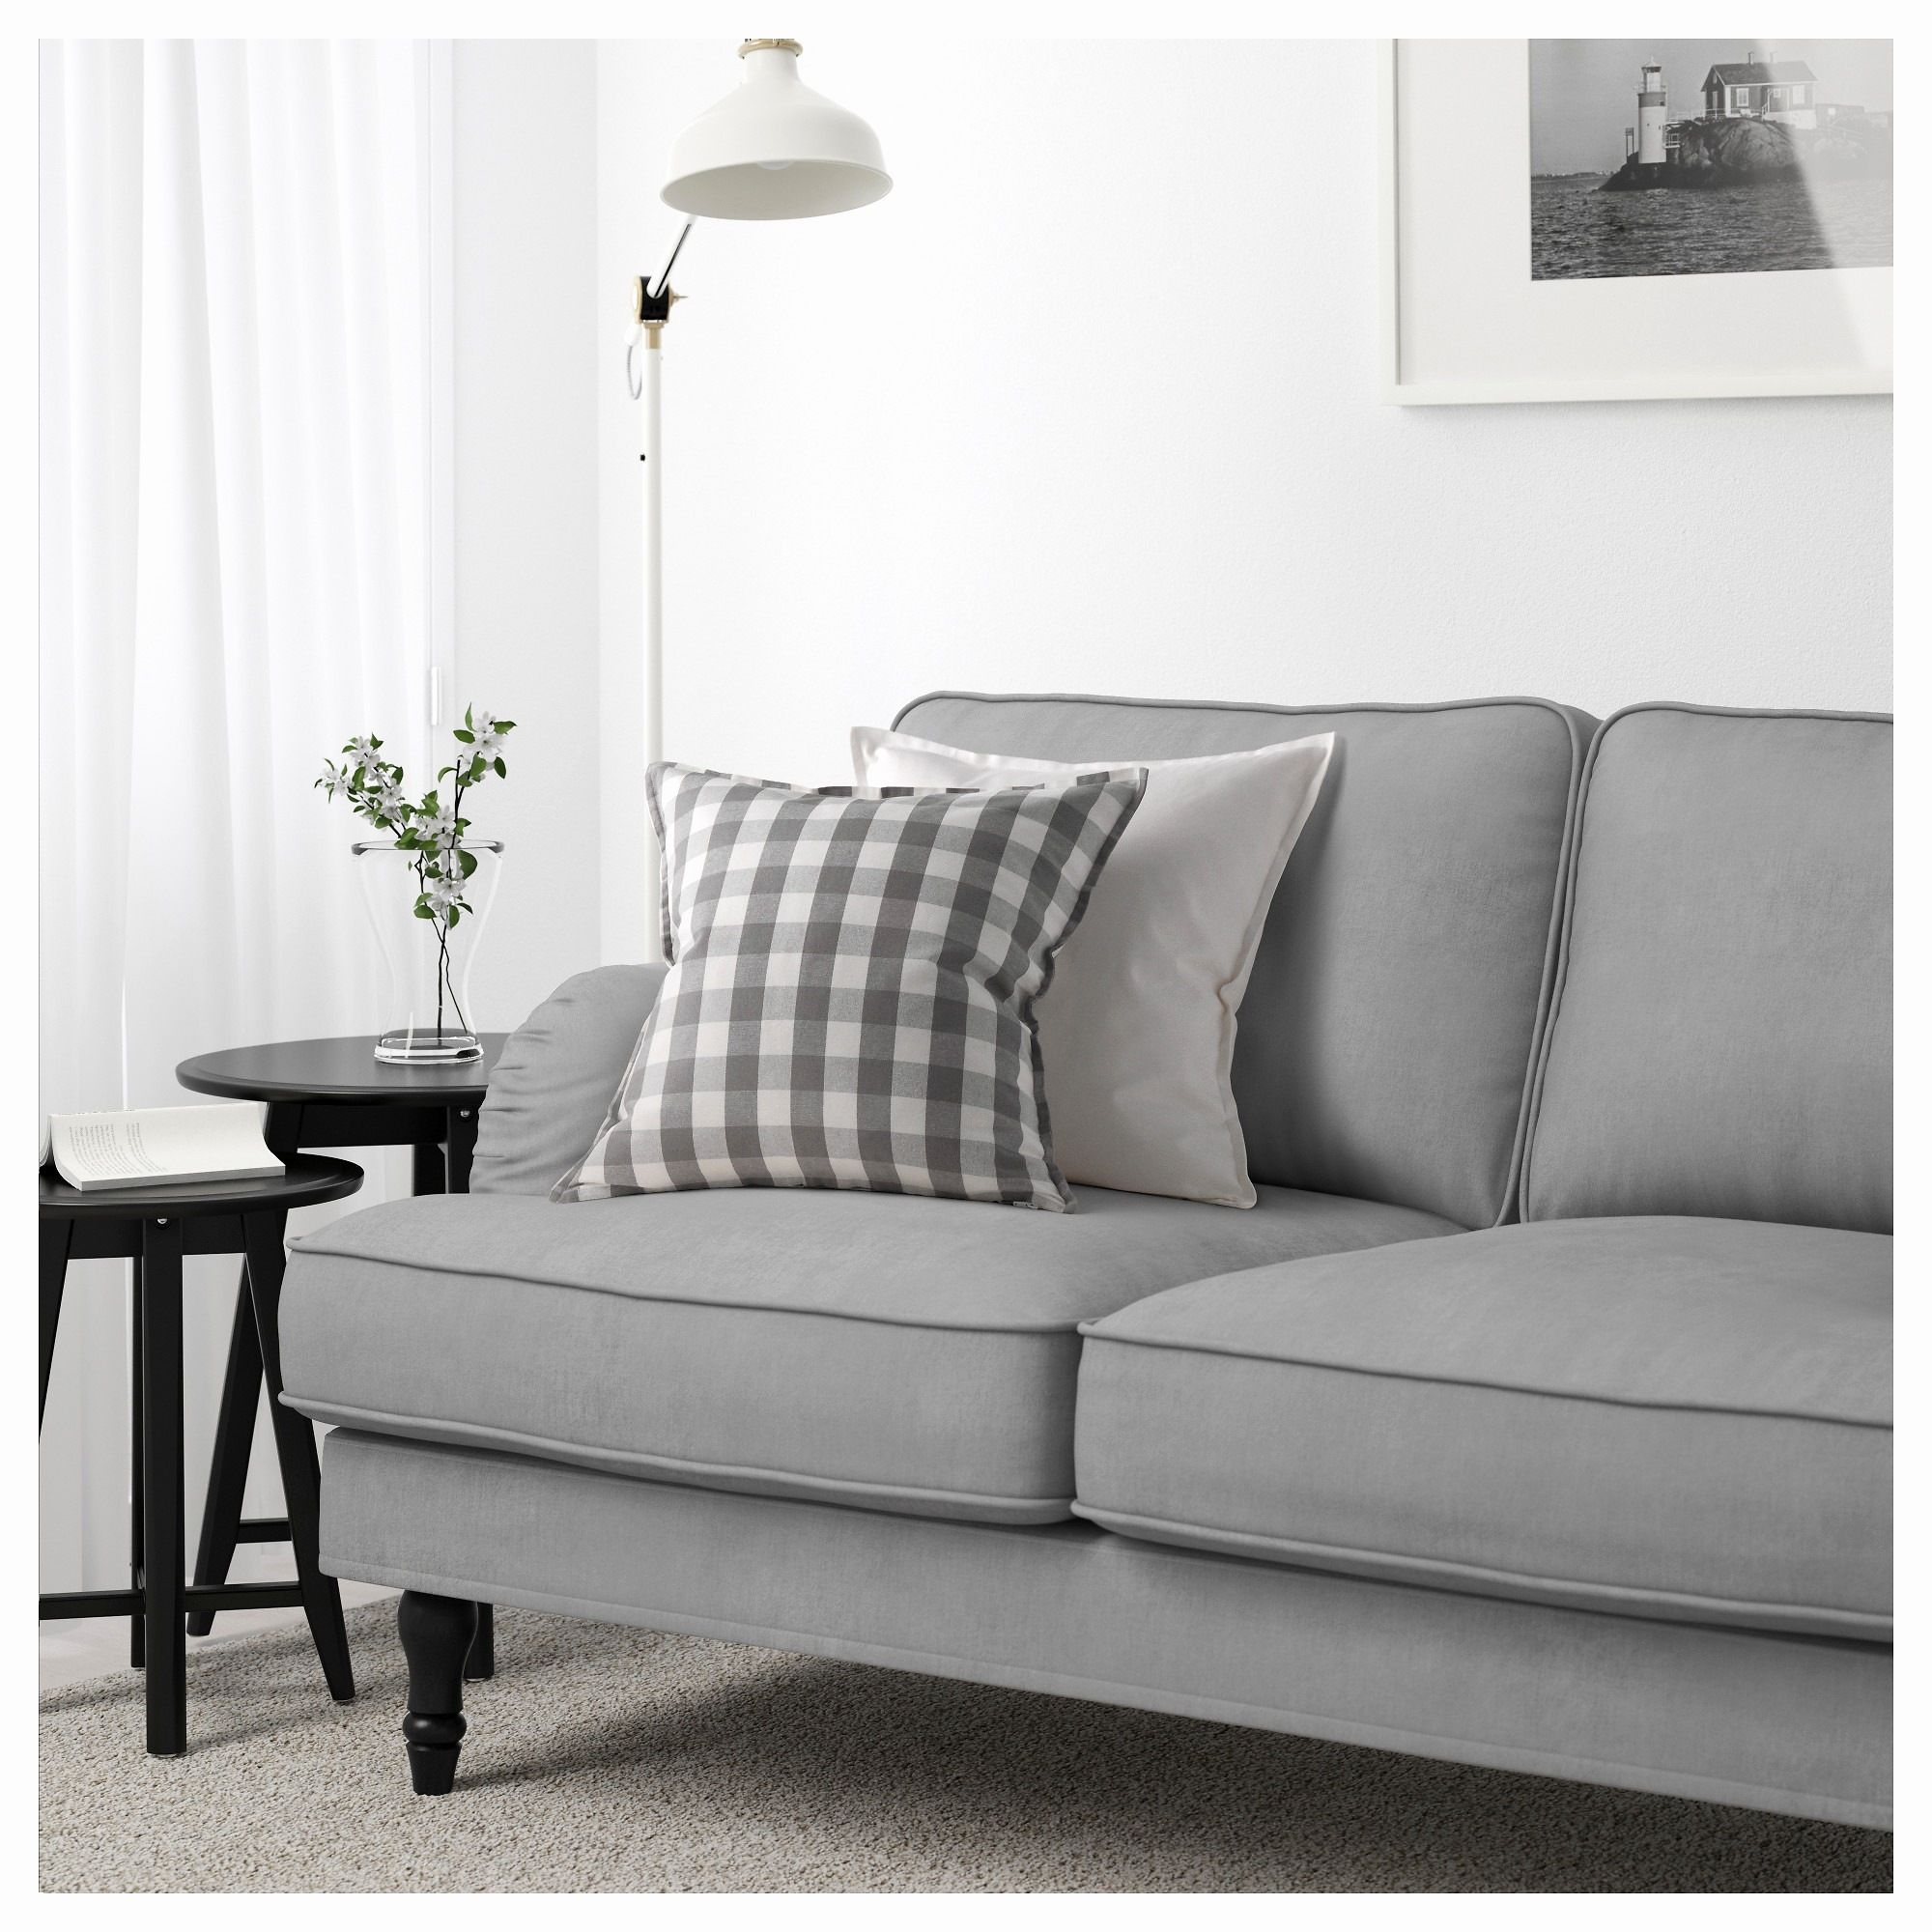 26 Schone Ikea Karlstad Sofa Sofamodelle Info Sofa Stocksund Sofa Couch Mobel